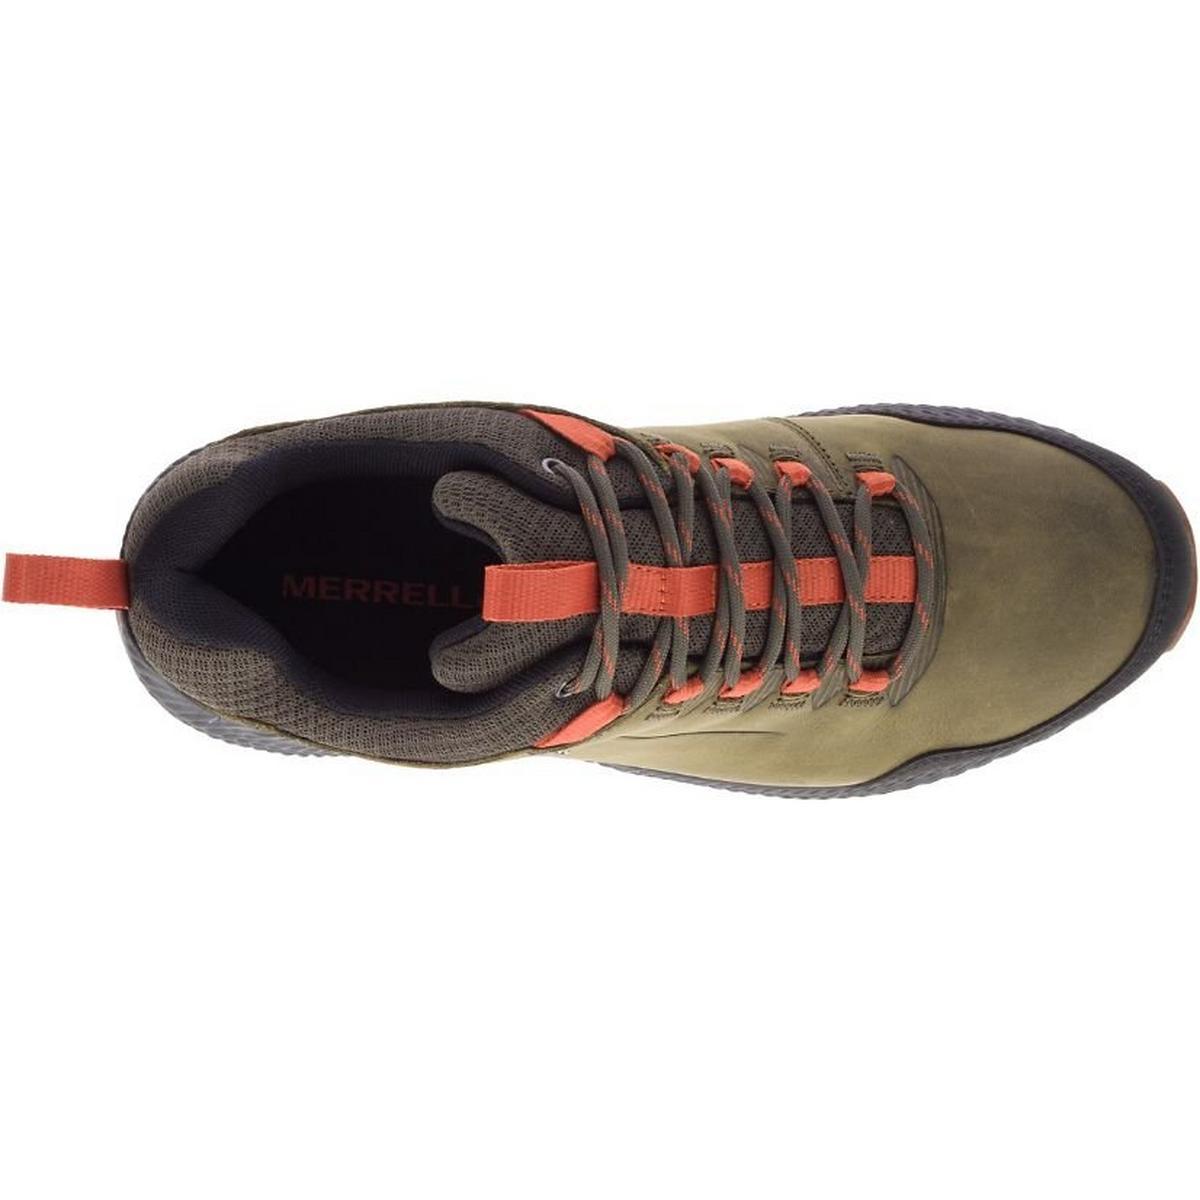 Merrell Men's Forestbound Waterproof Shoe - Dark Olive